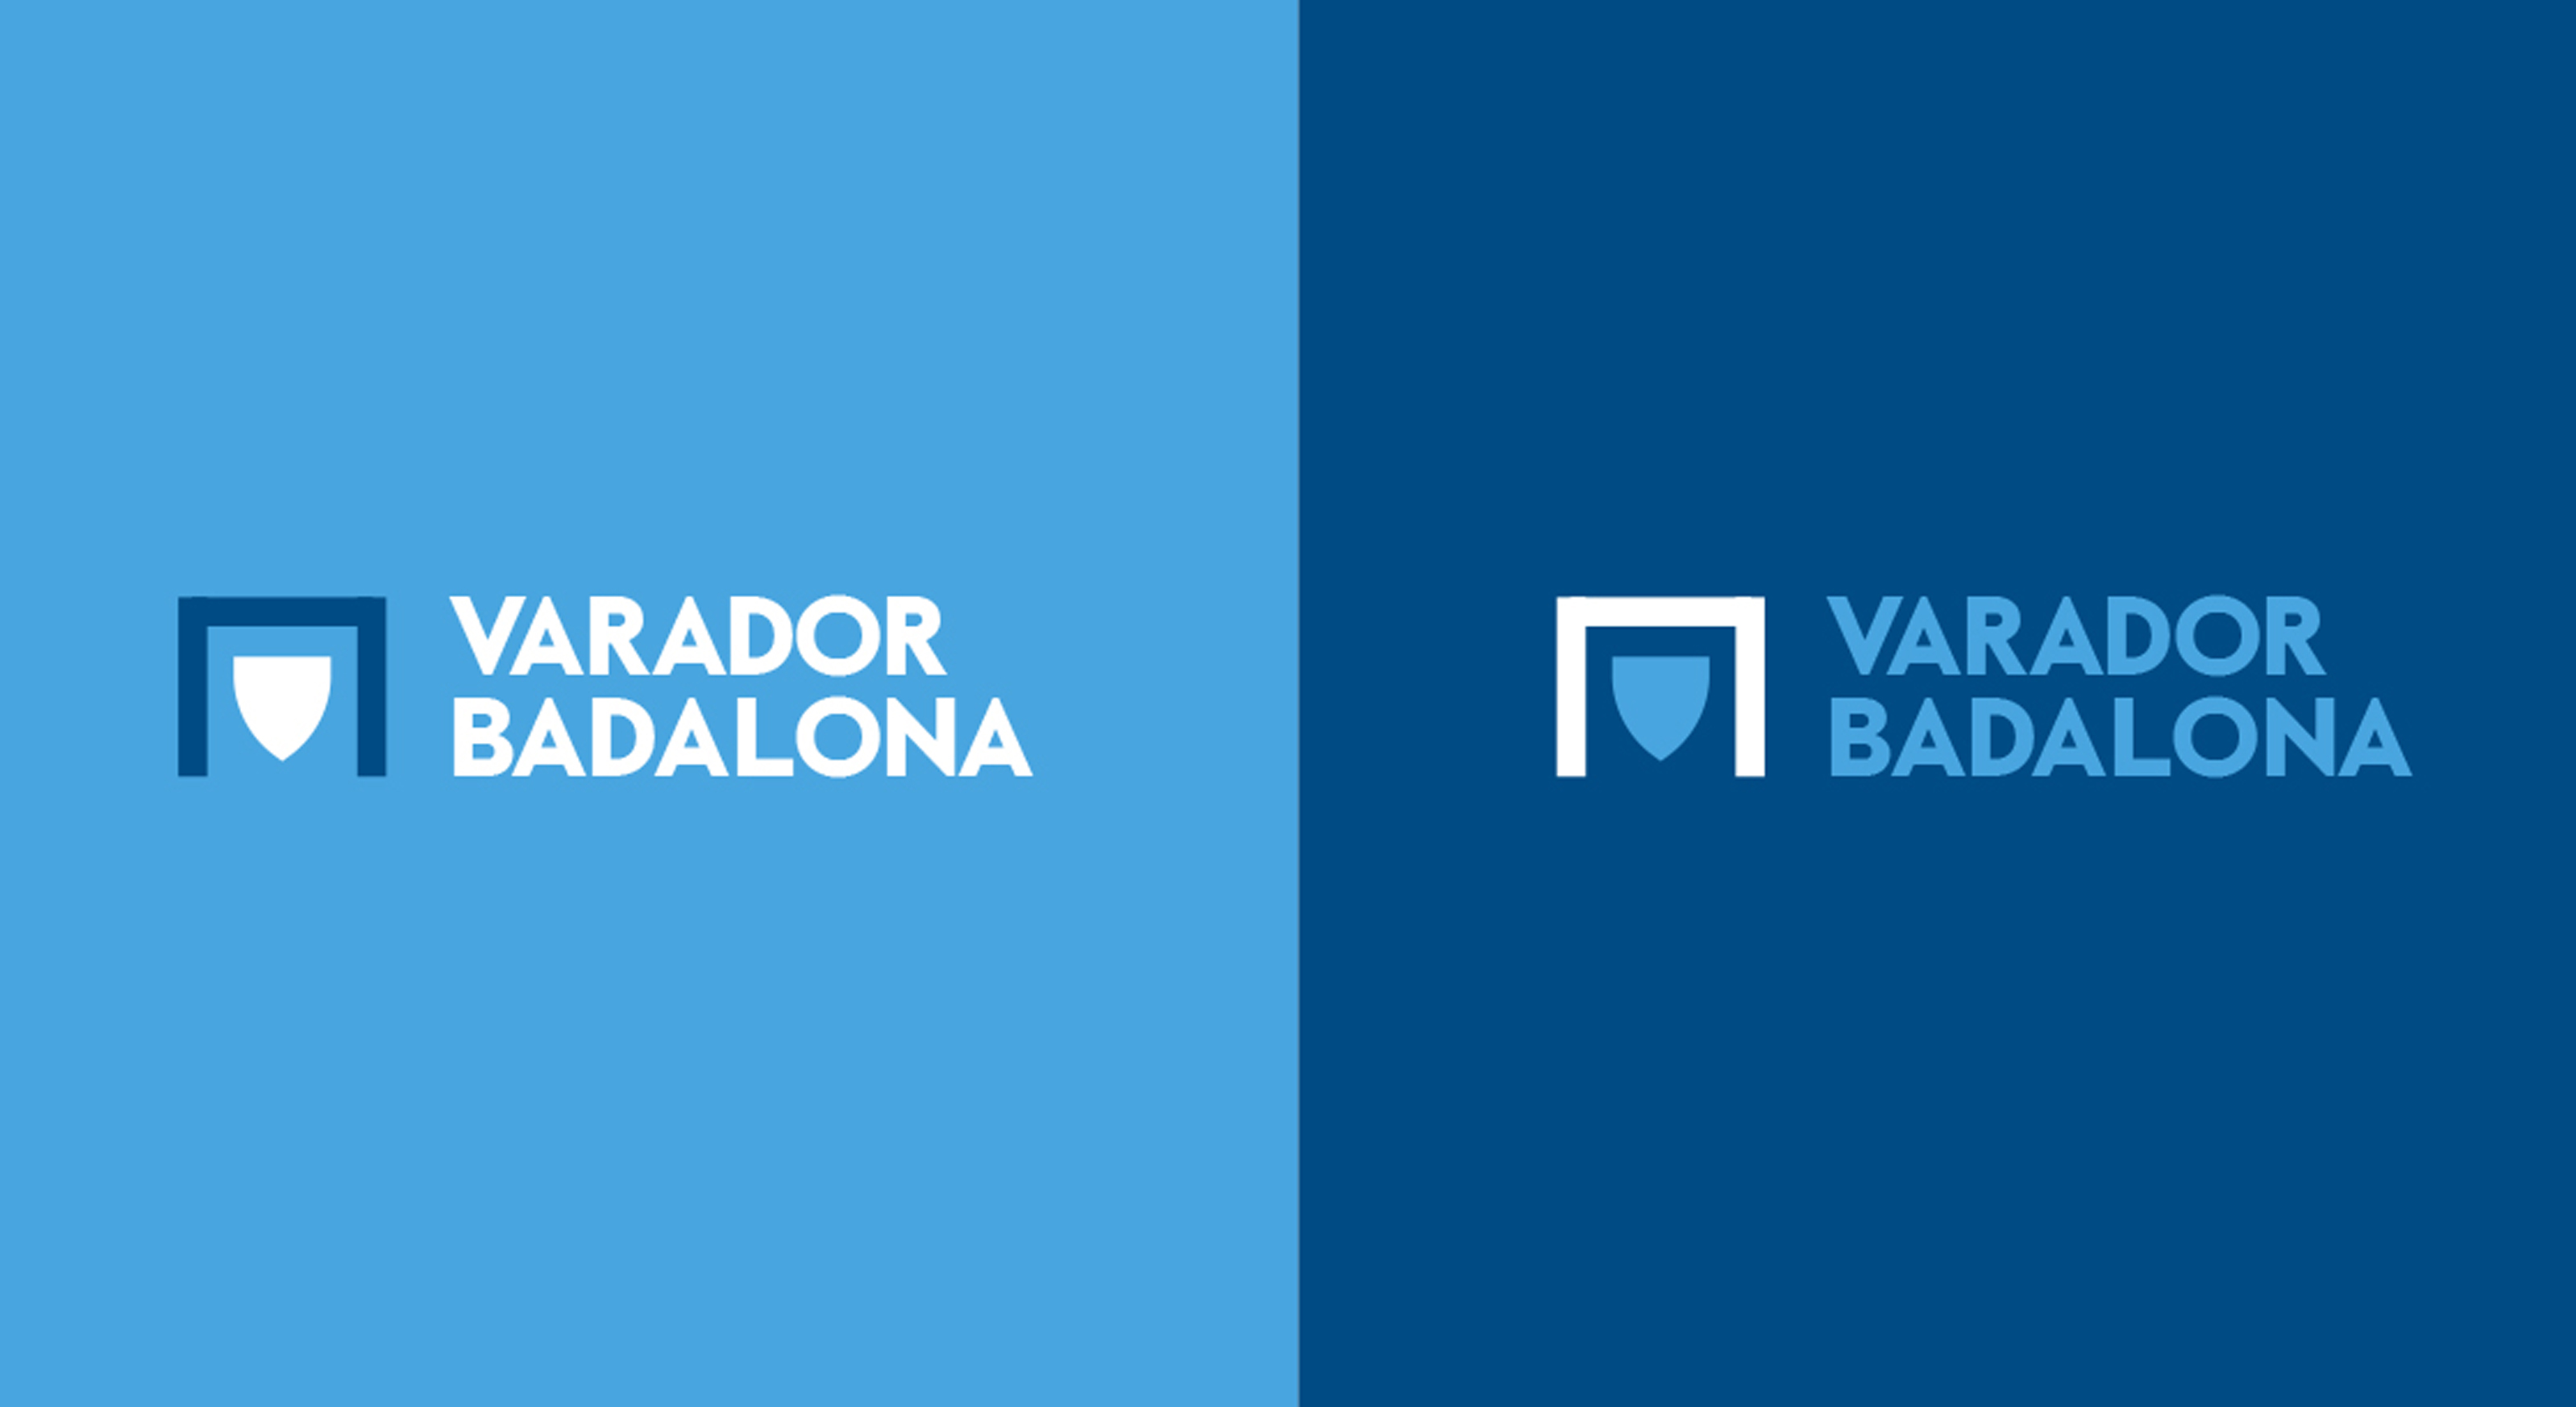 Varador_badalona_7.jpg